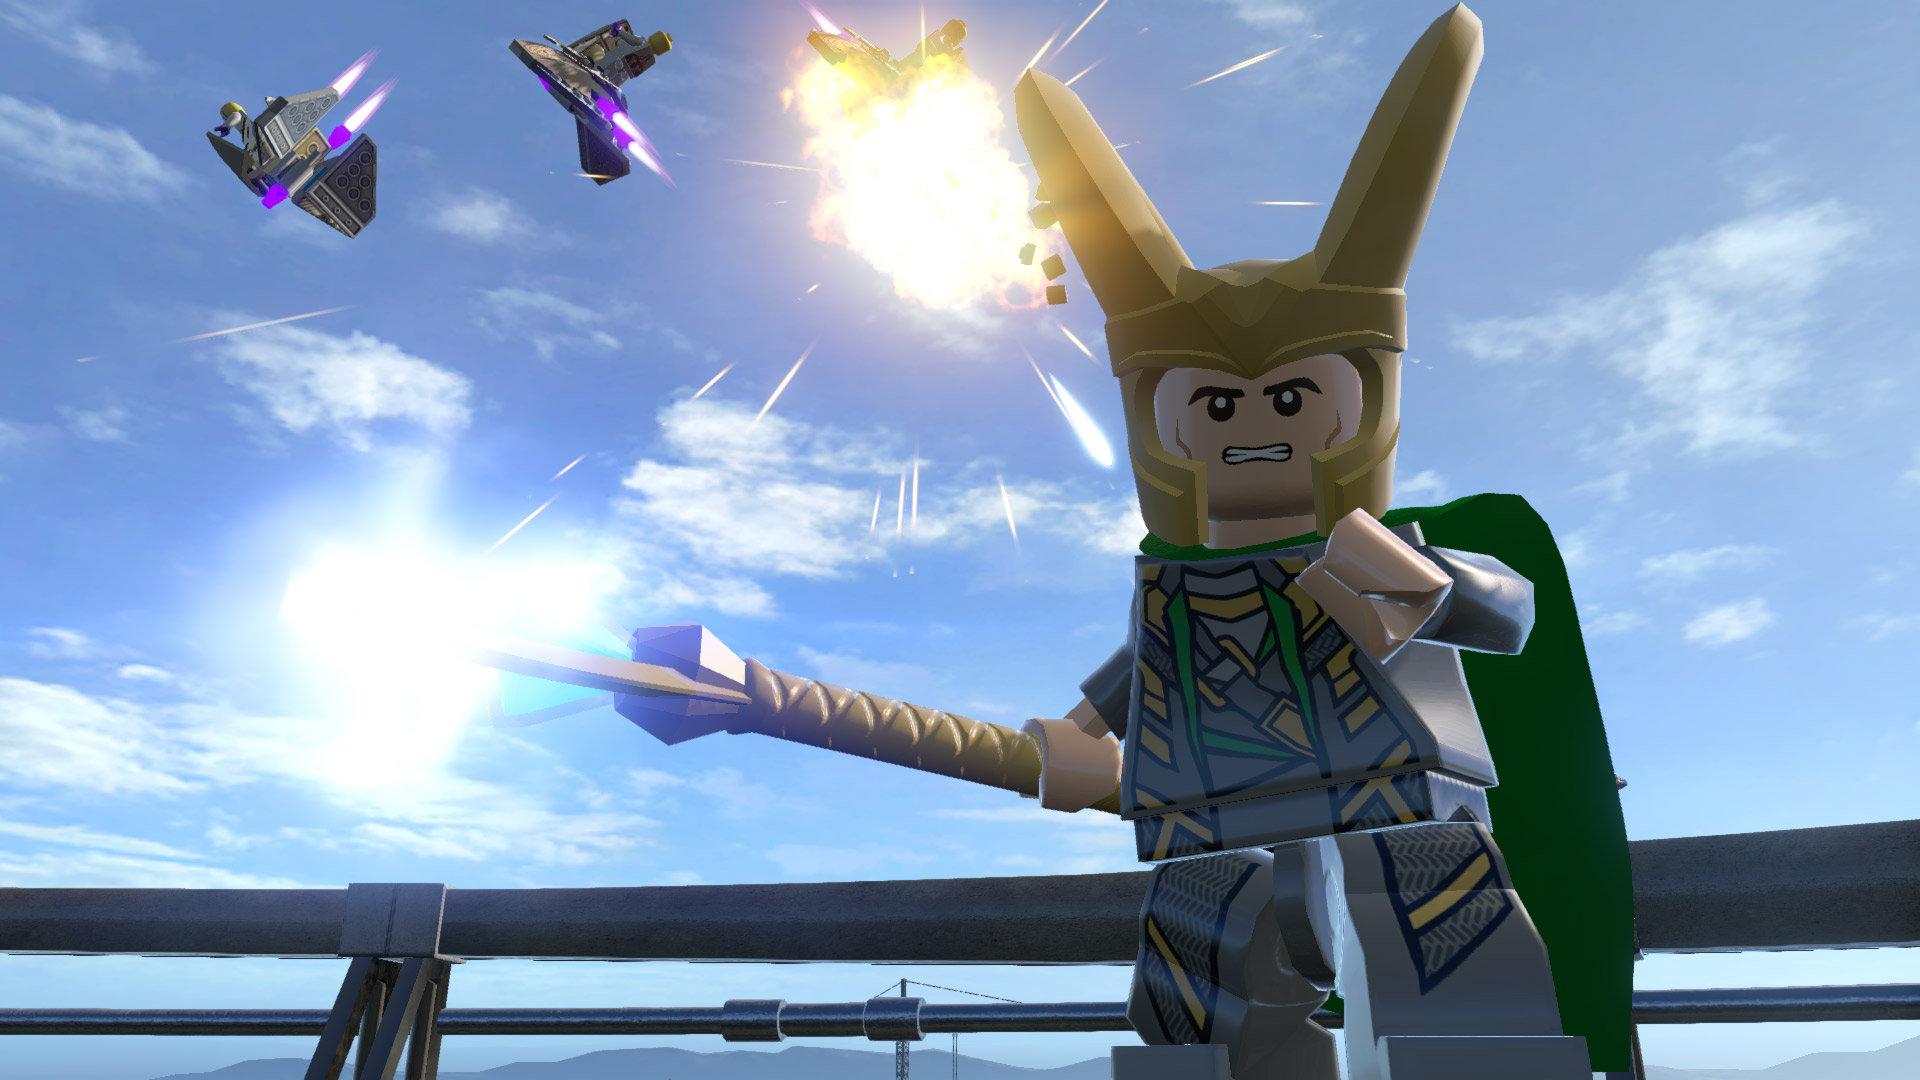 lego-marvels-avengers-screen-06-ps4-us-1